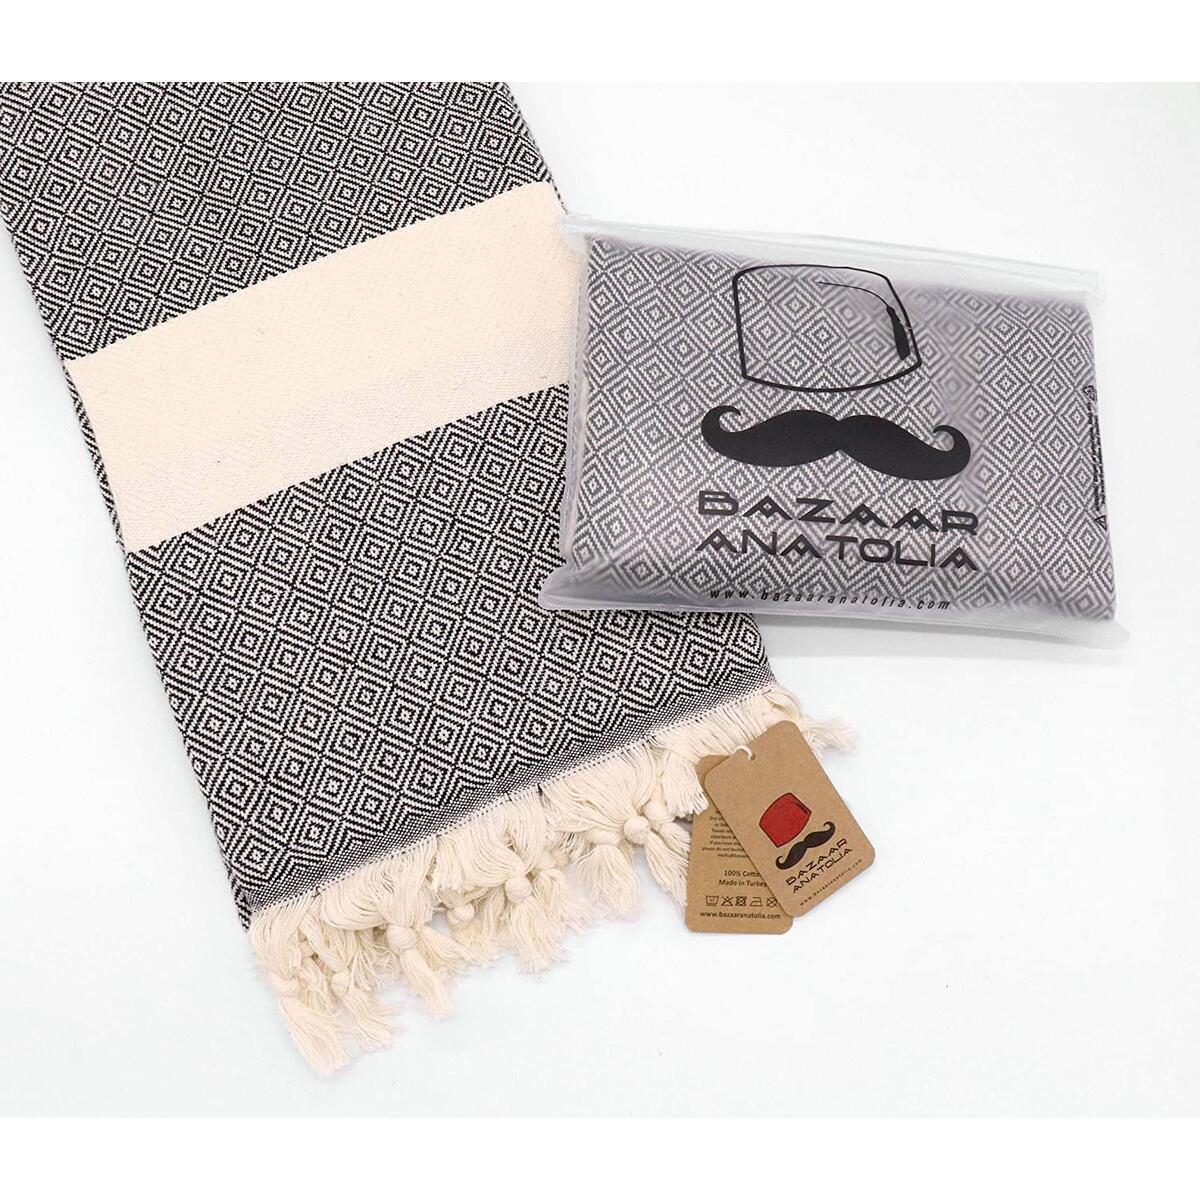 Diamond Turkish Towel 100% Cotton Bath Towel Peshtemal Beach Towel 77x38